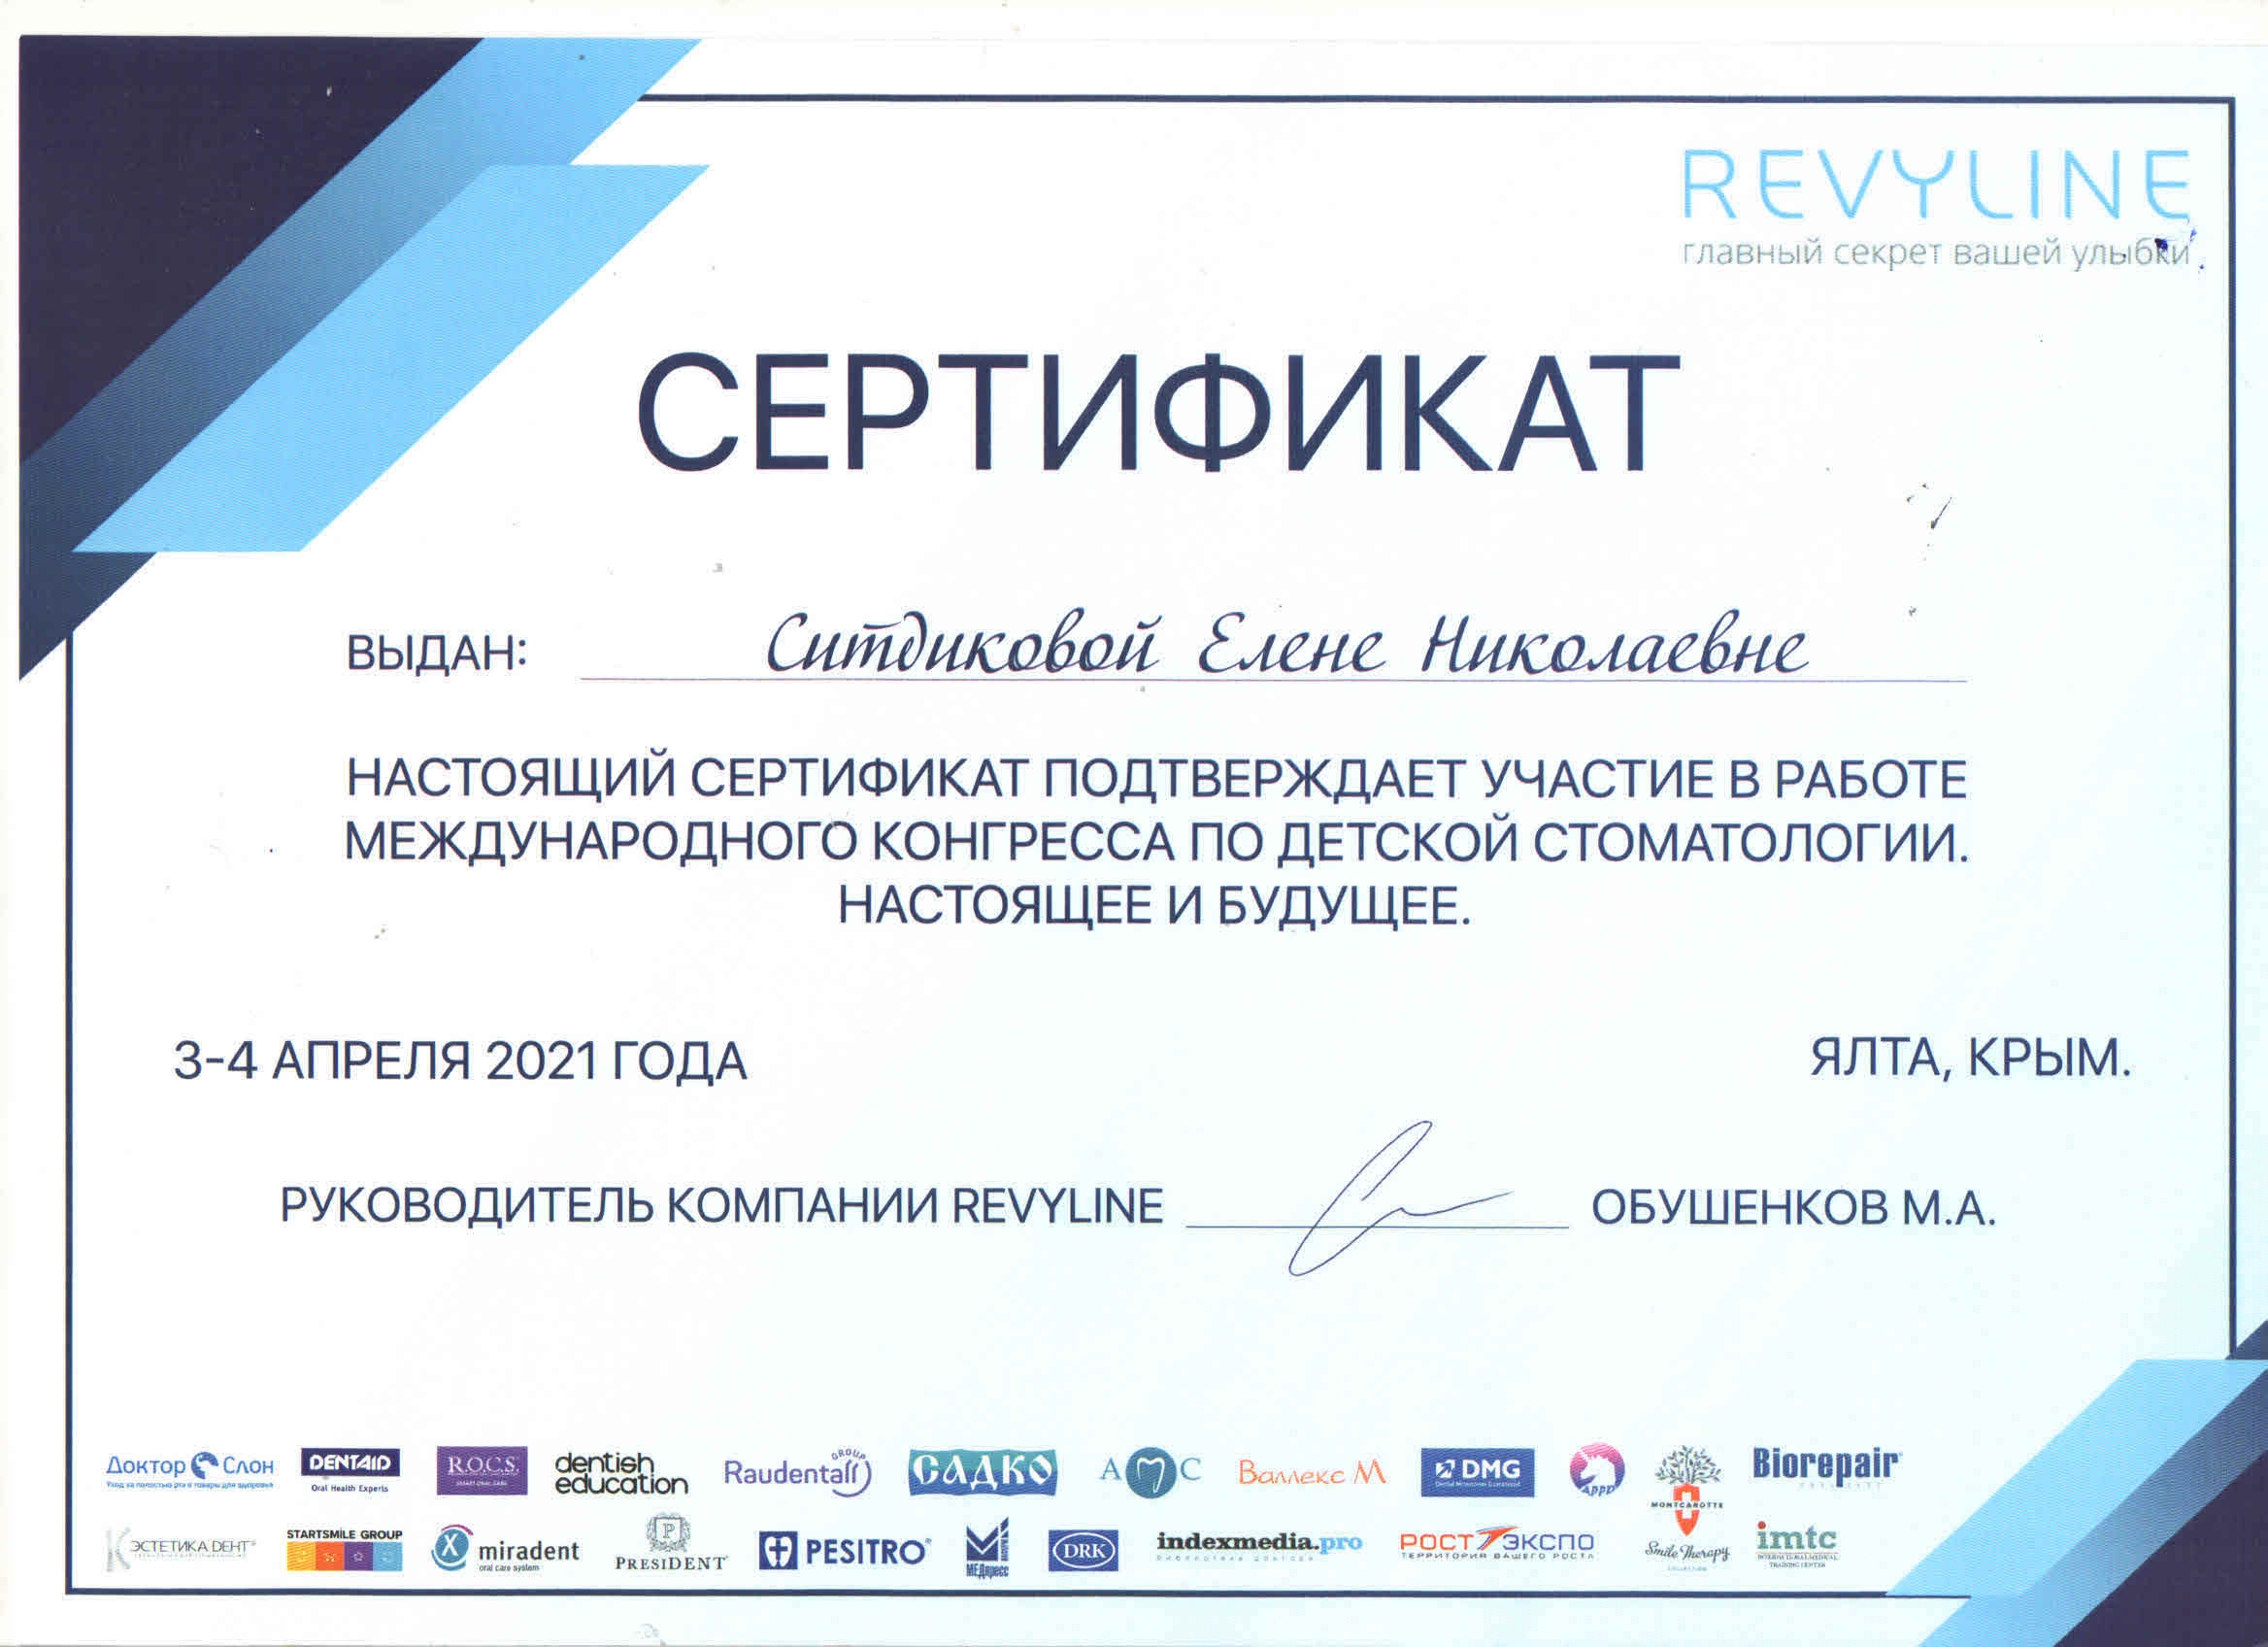 Ситдикова Е.Н.